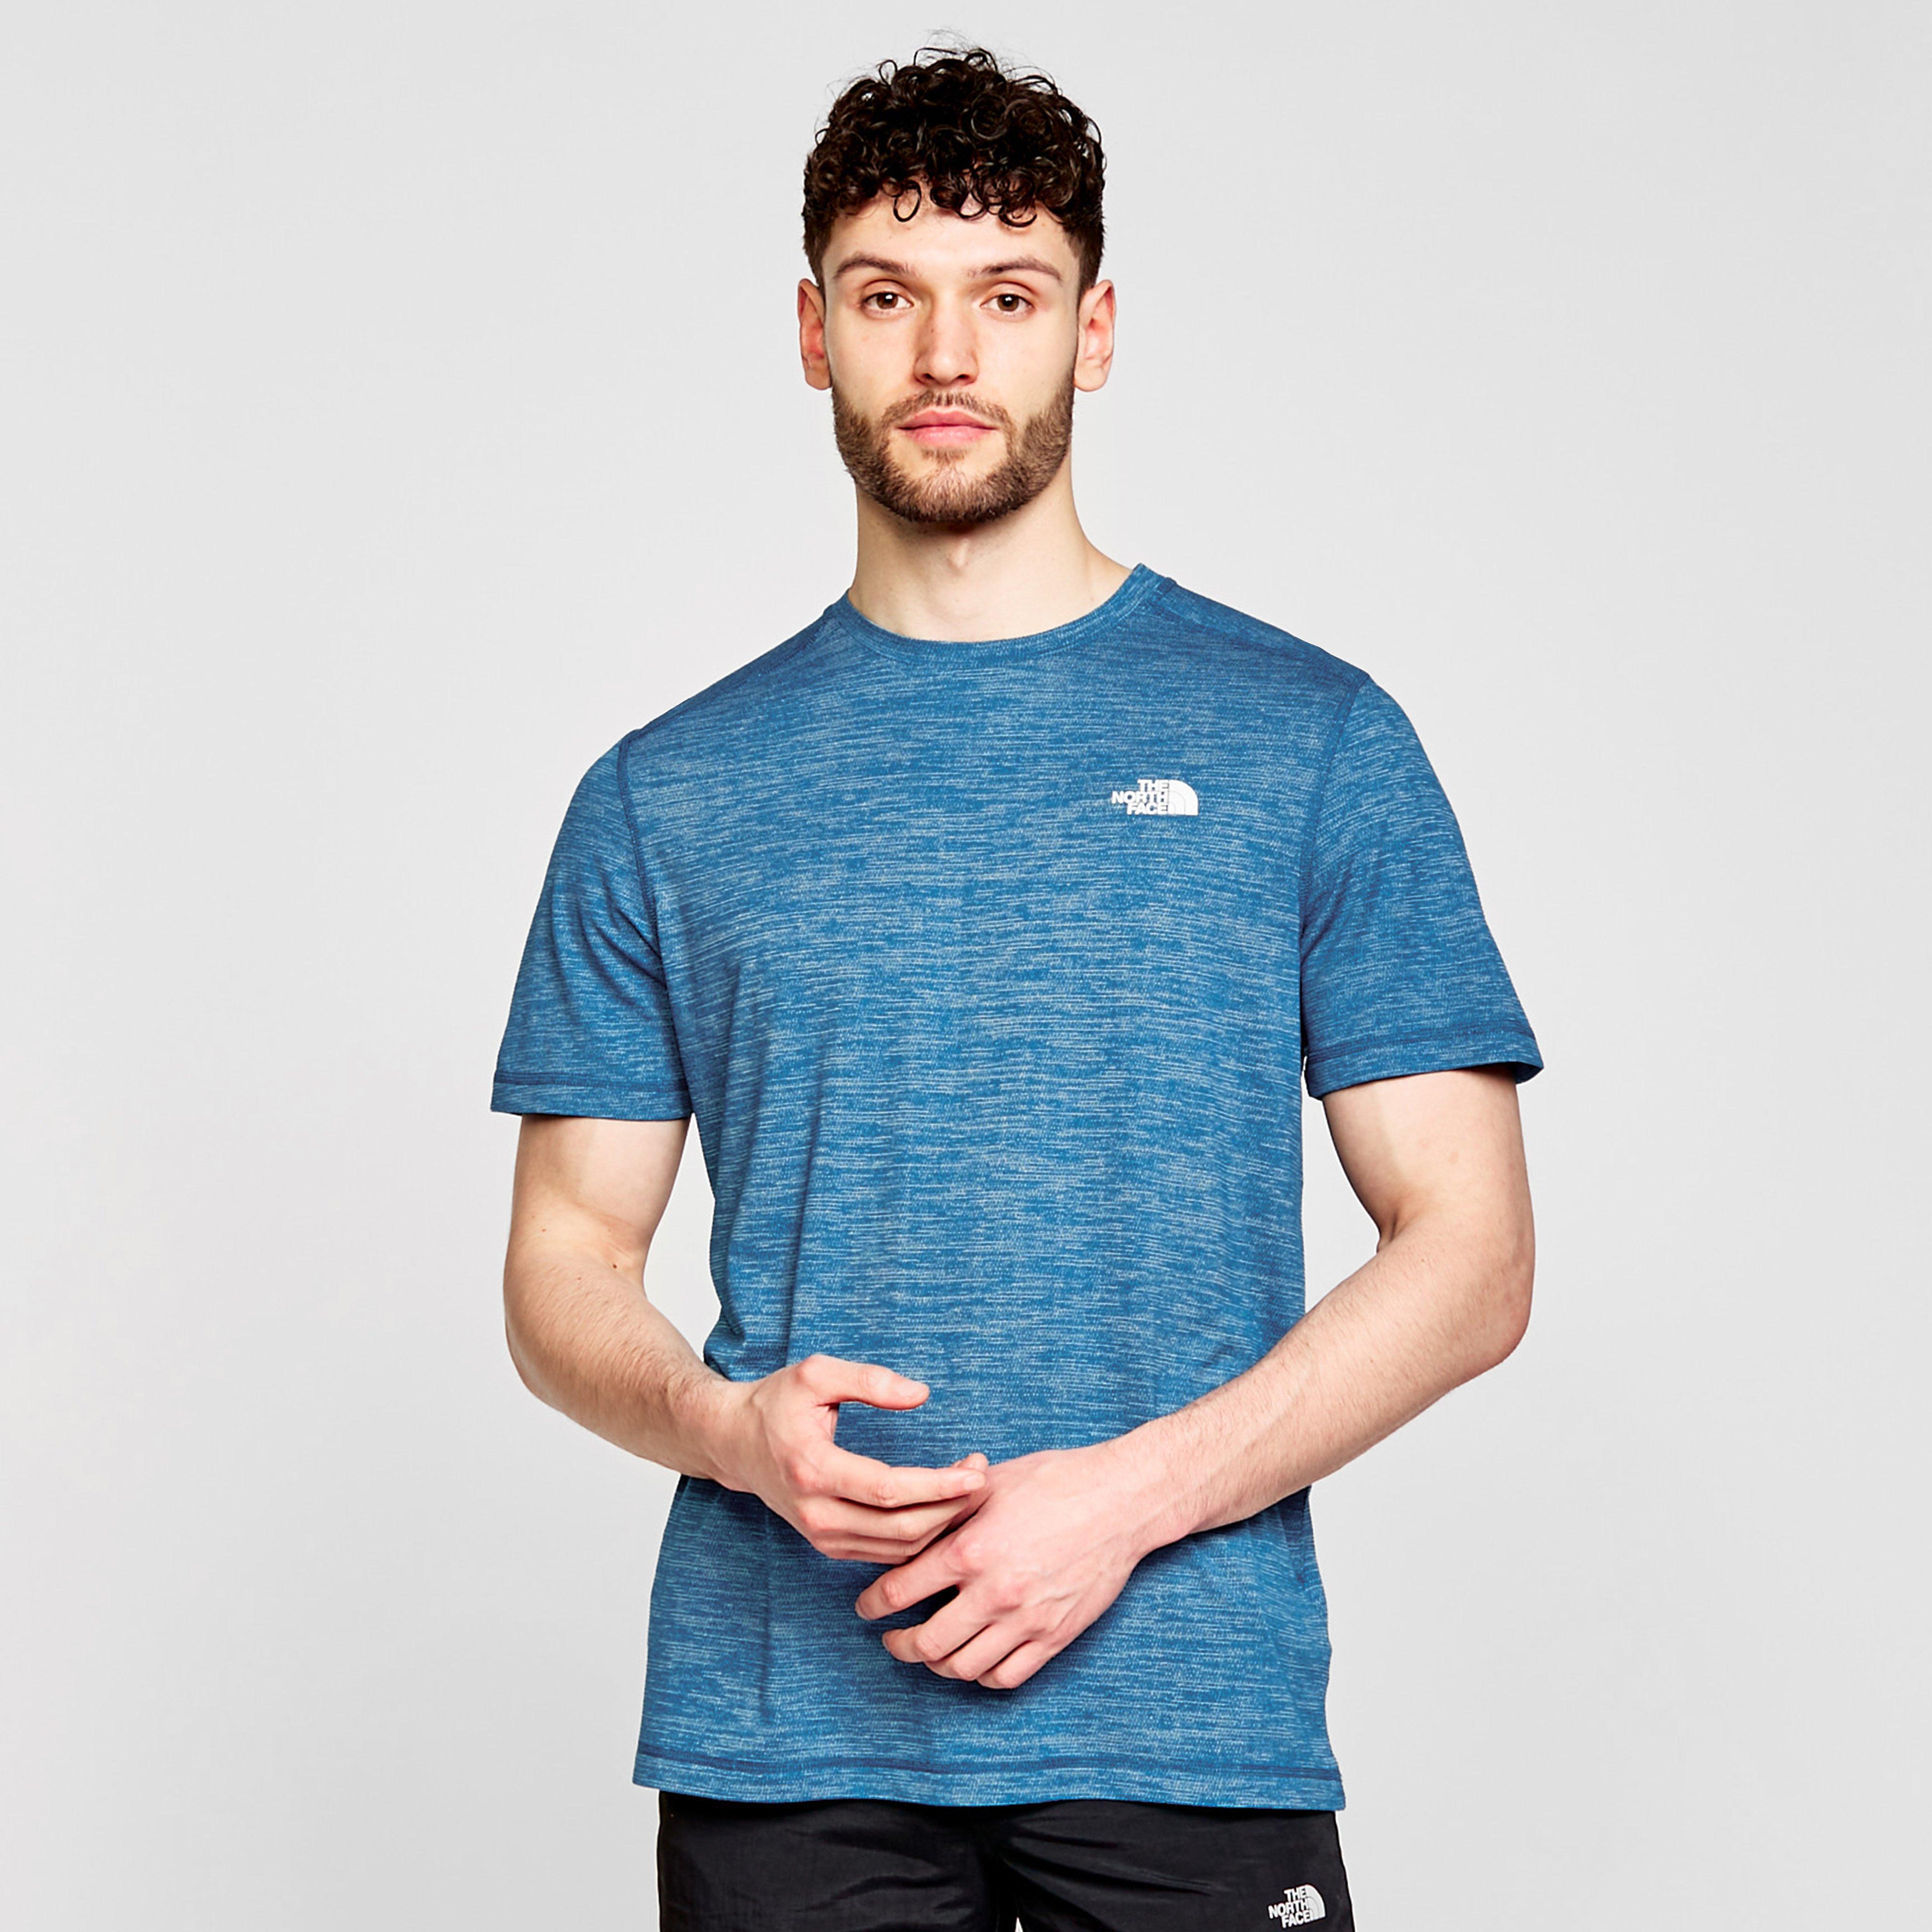 Image of The North Face Men's Lightning T-Shirt - Blue/Blue, Blue/Blue